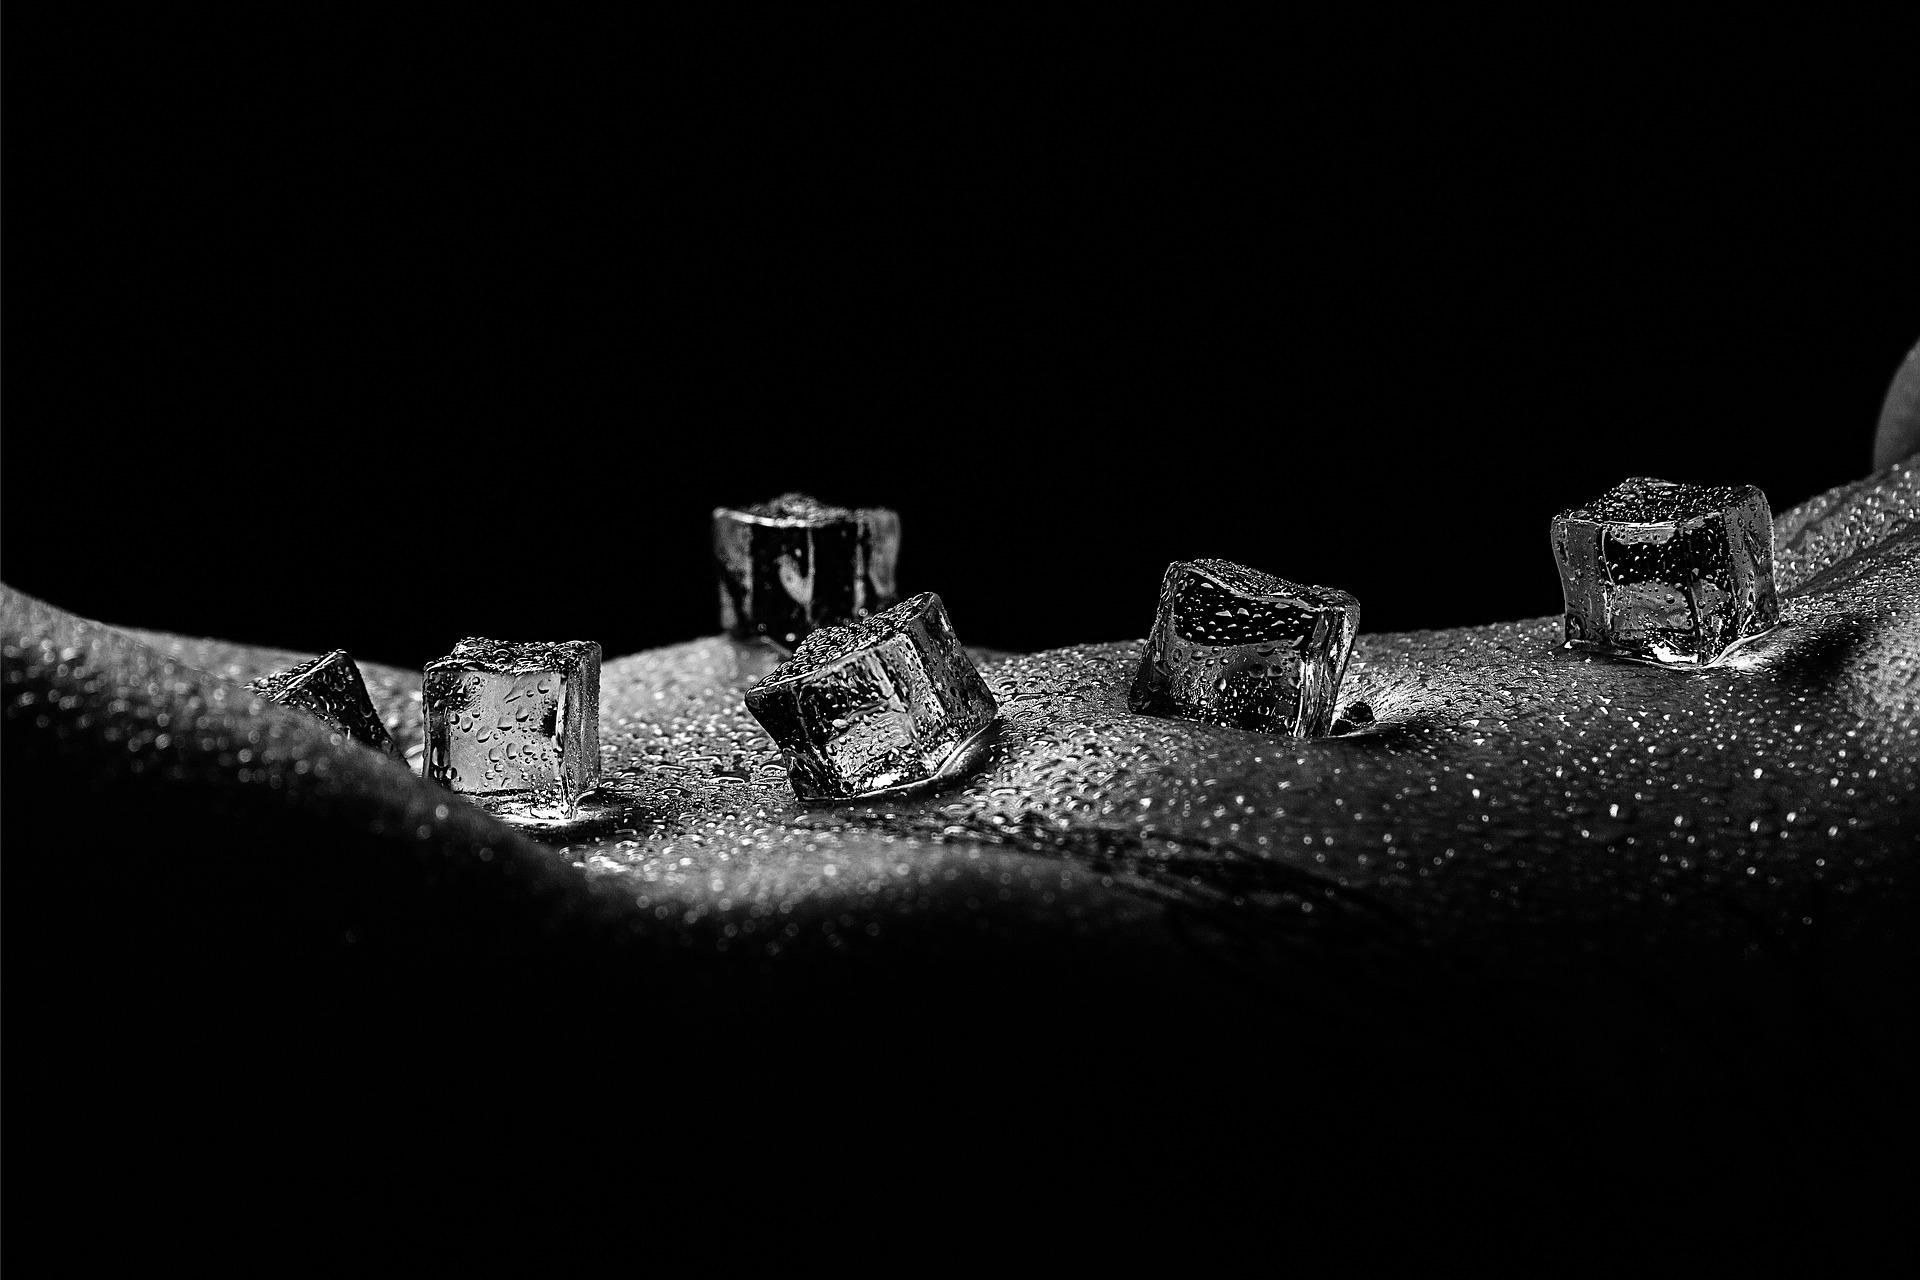 ice-cubes-4313757_1920